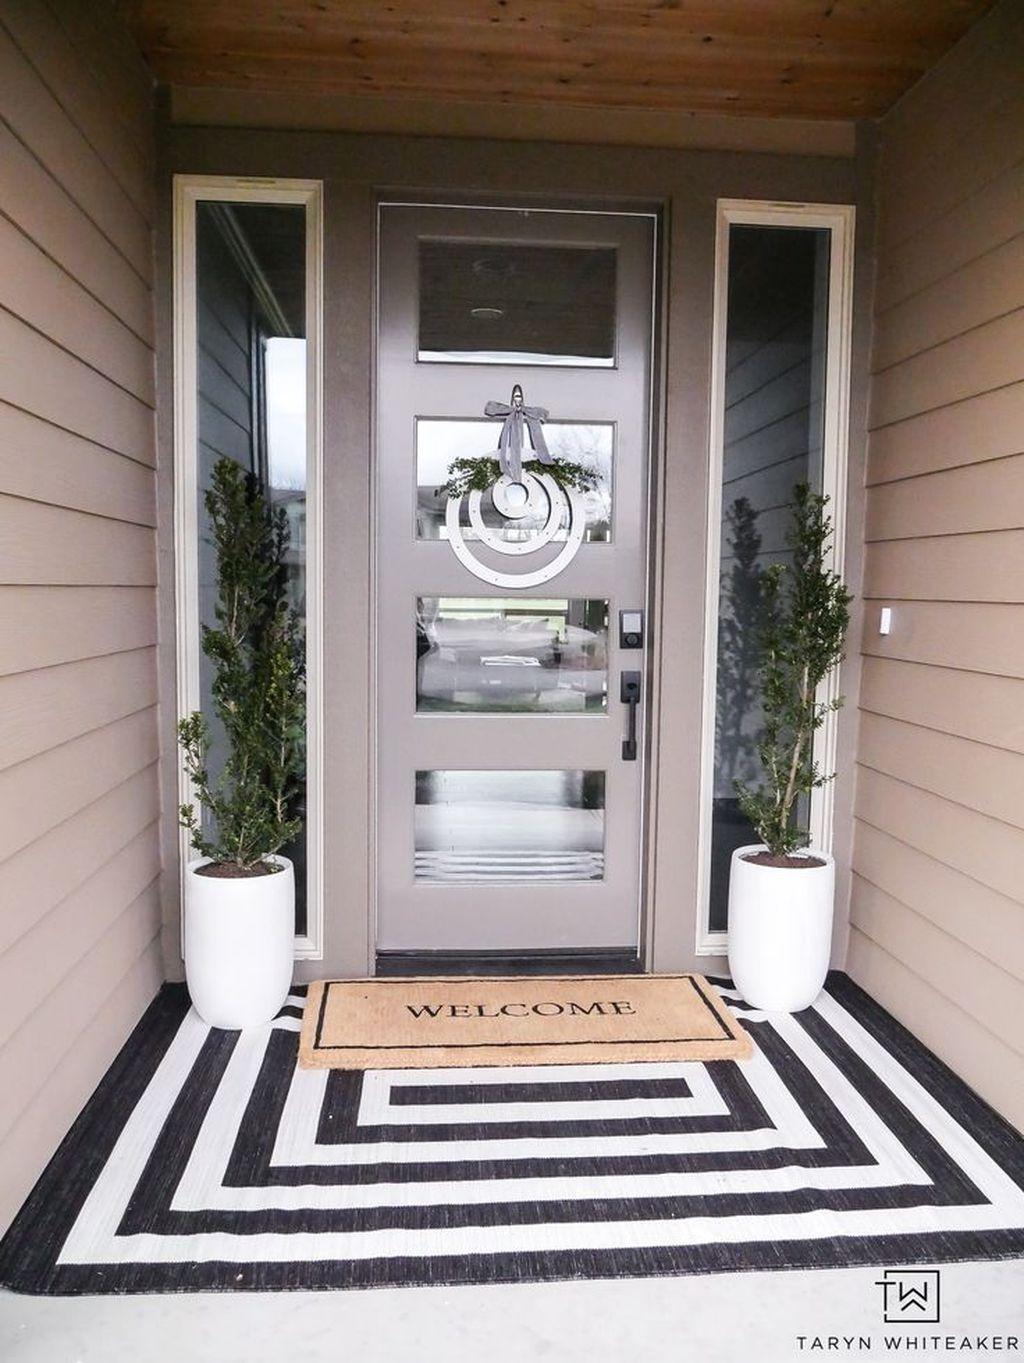 Inspiring Spring Planters Design Ideas For Front Door 21